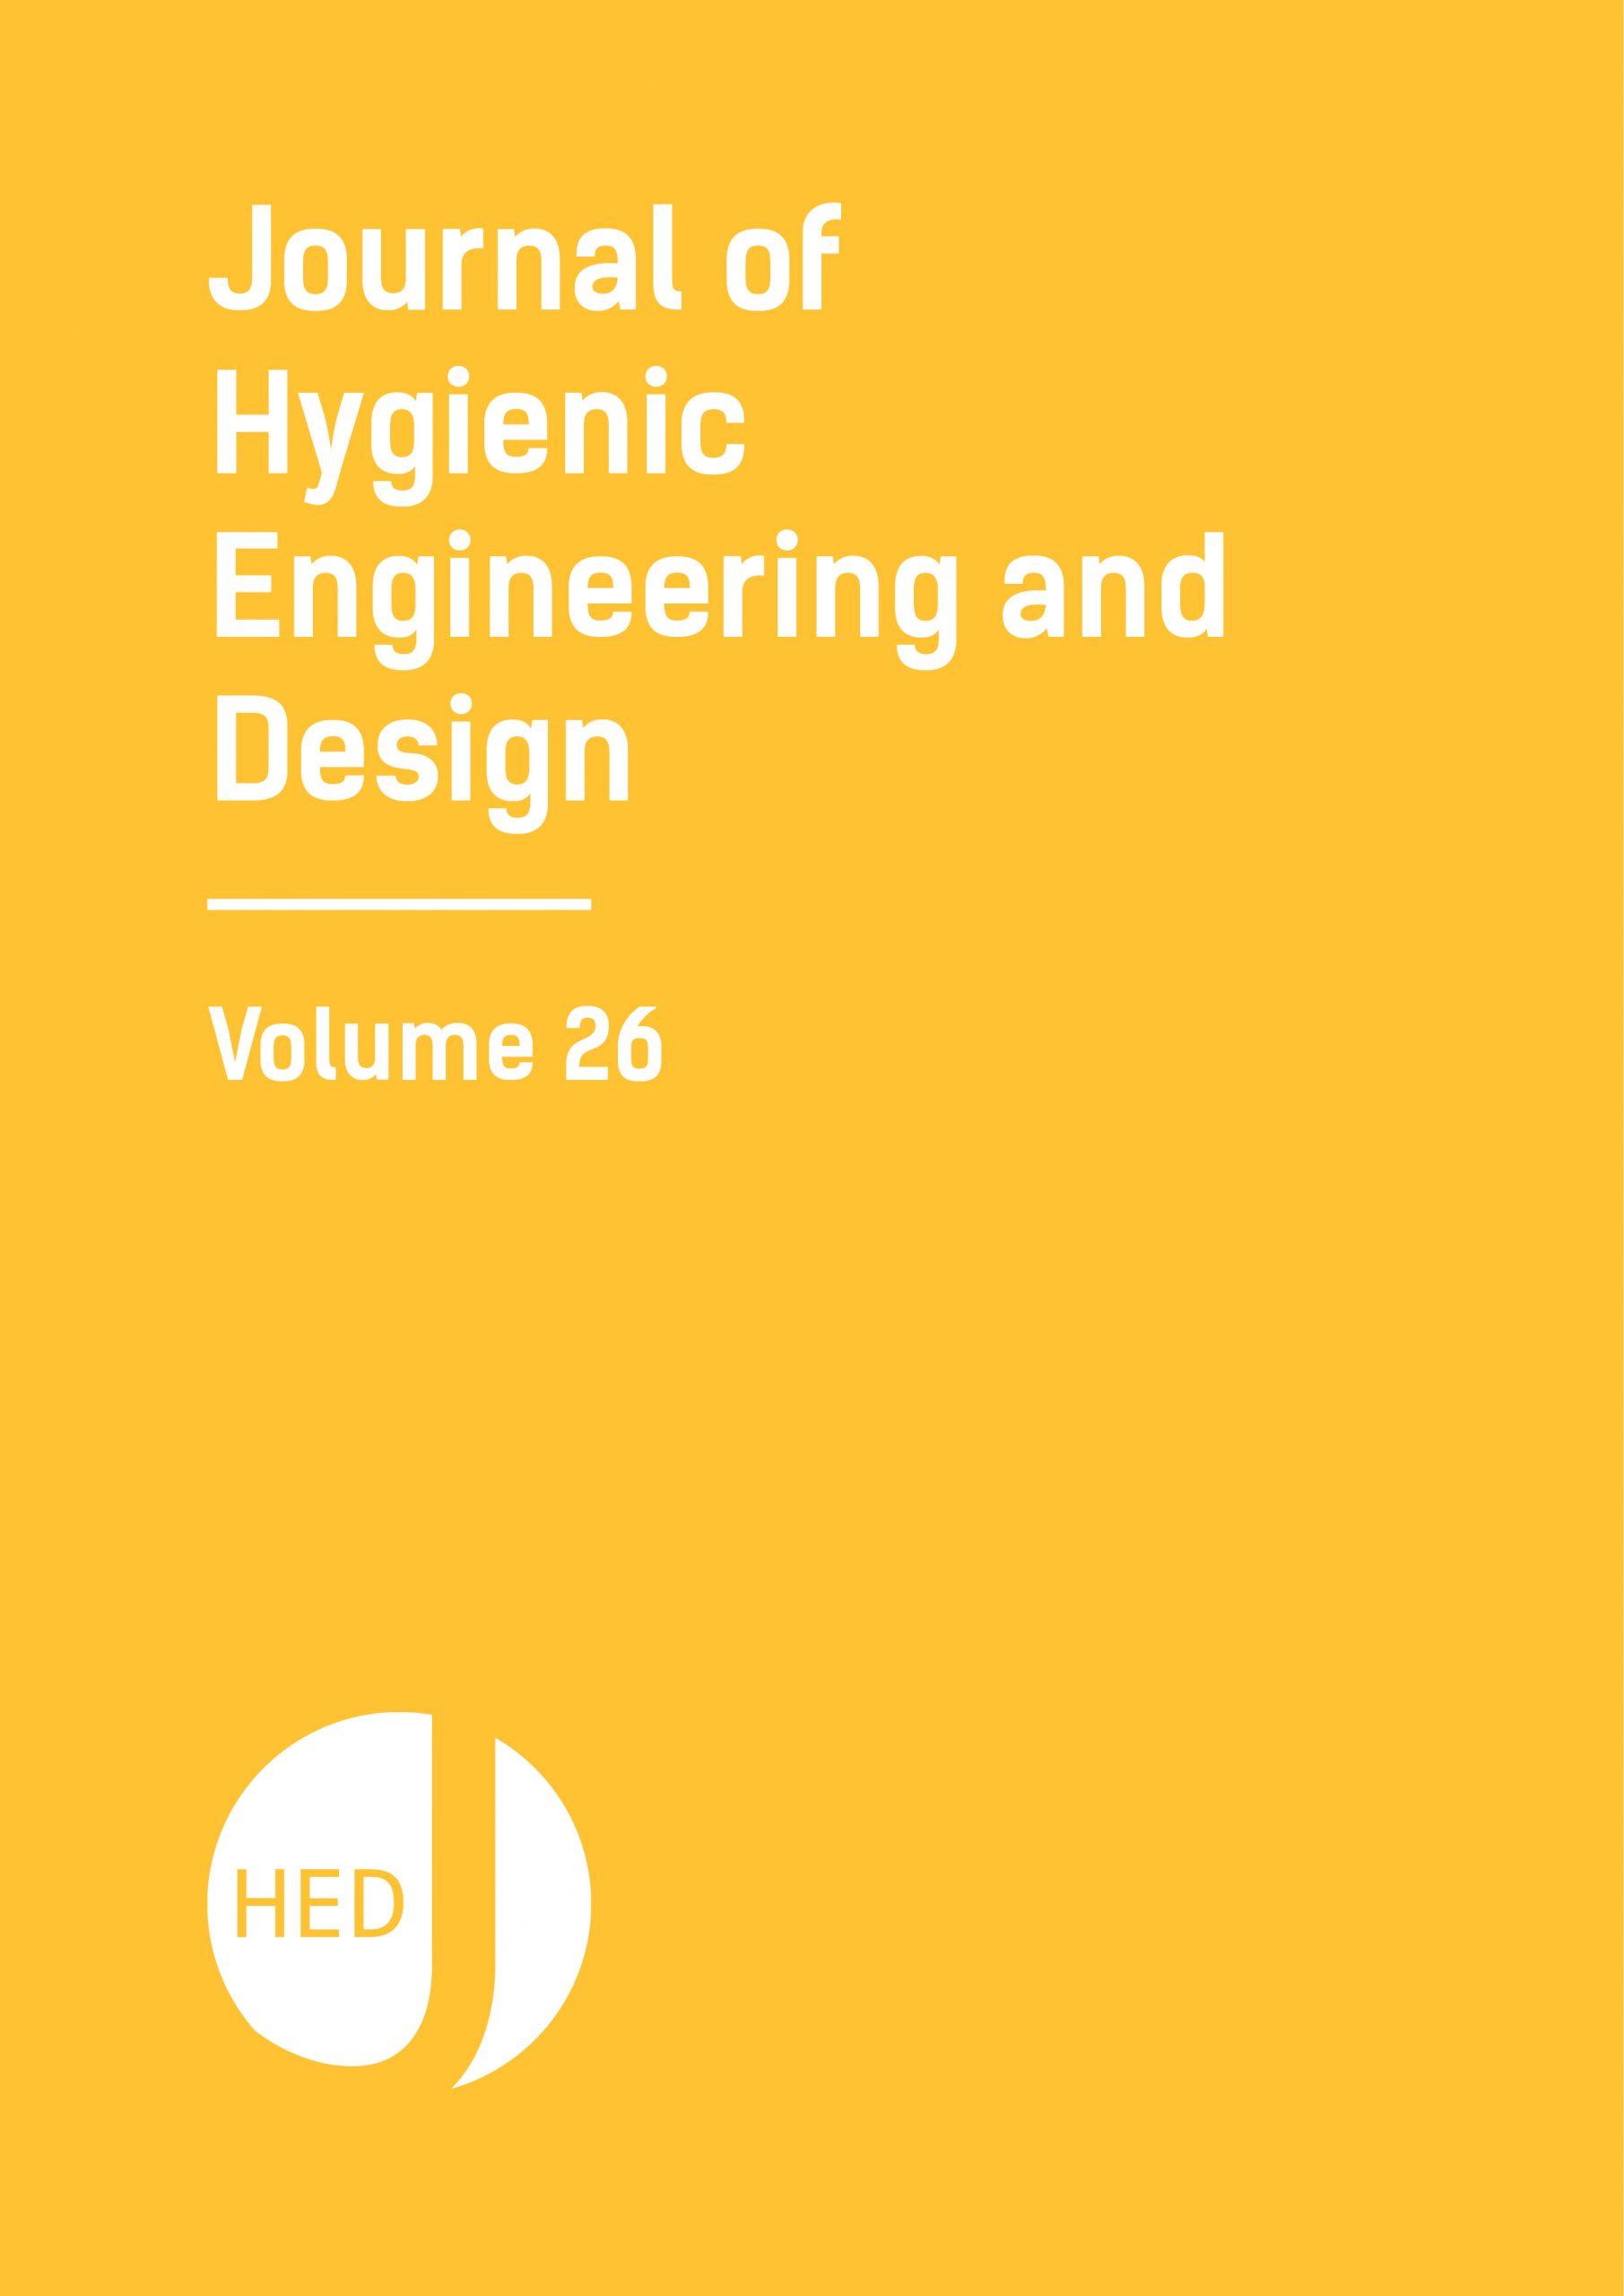 JHED Volume 26